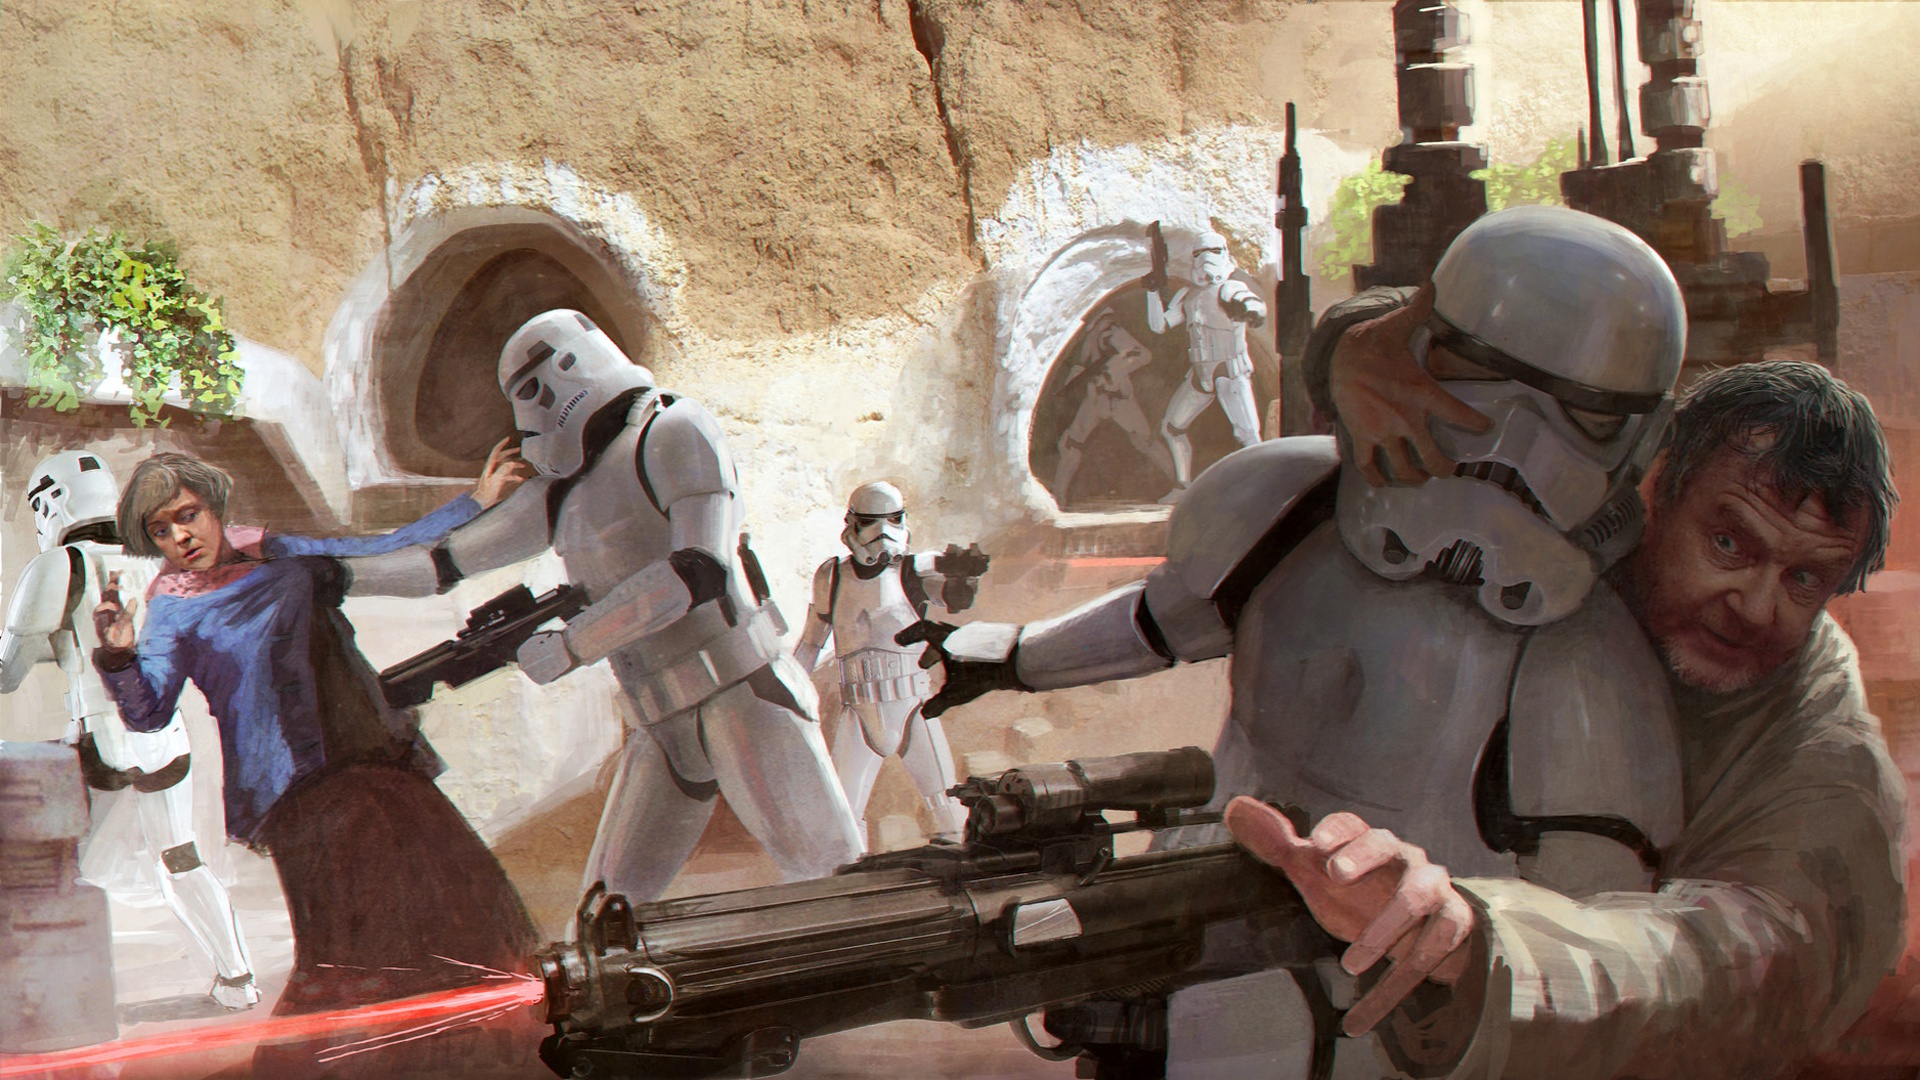 General 1920x1080 Tatooine Imperial Forces stormtrooper Storm Troopers Star Wars